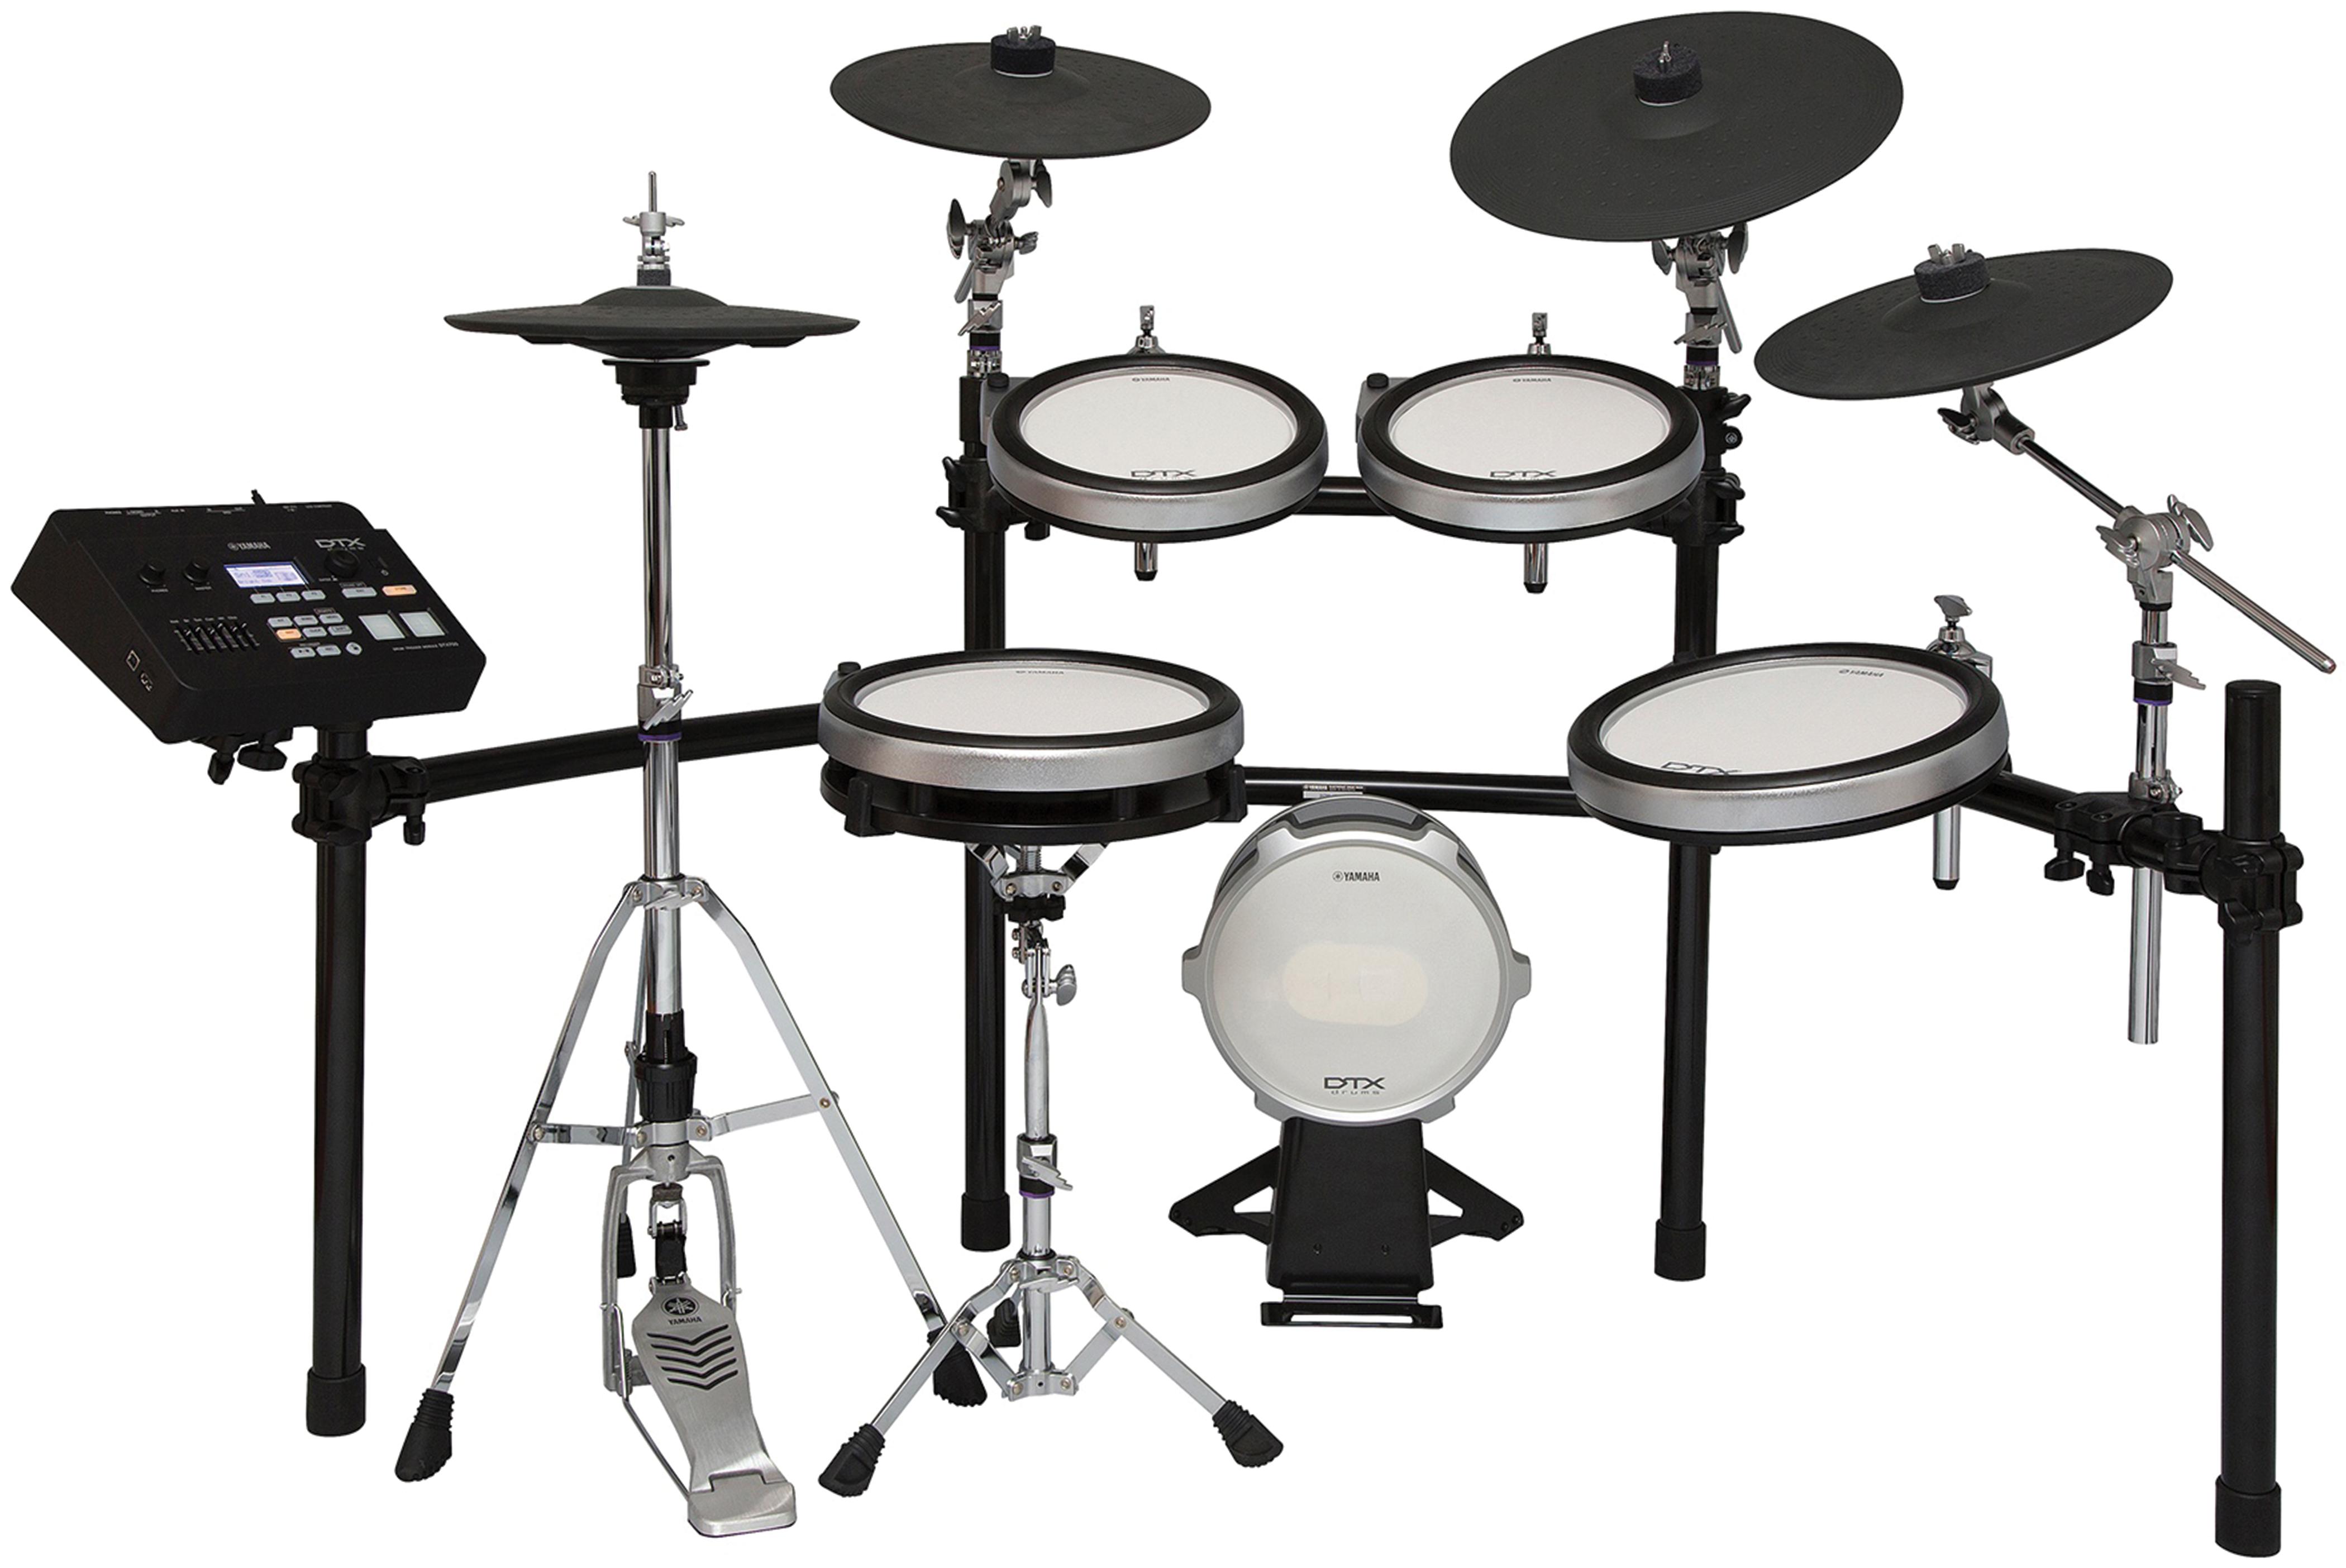 Yamaha dtx760k electronic drumset modern drummer magazine for Yamaha dtx pad set